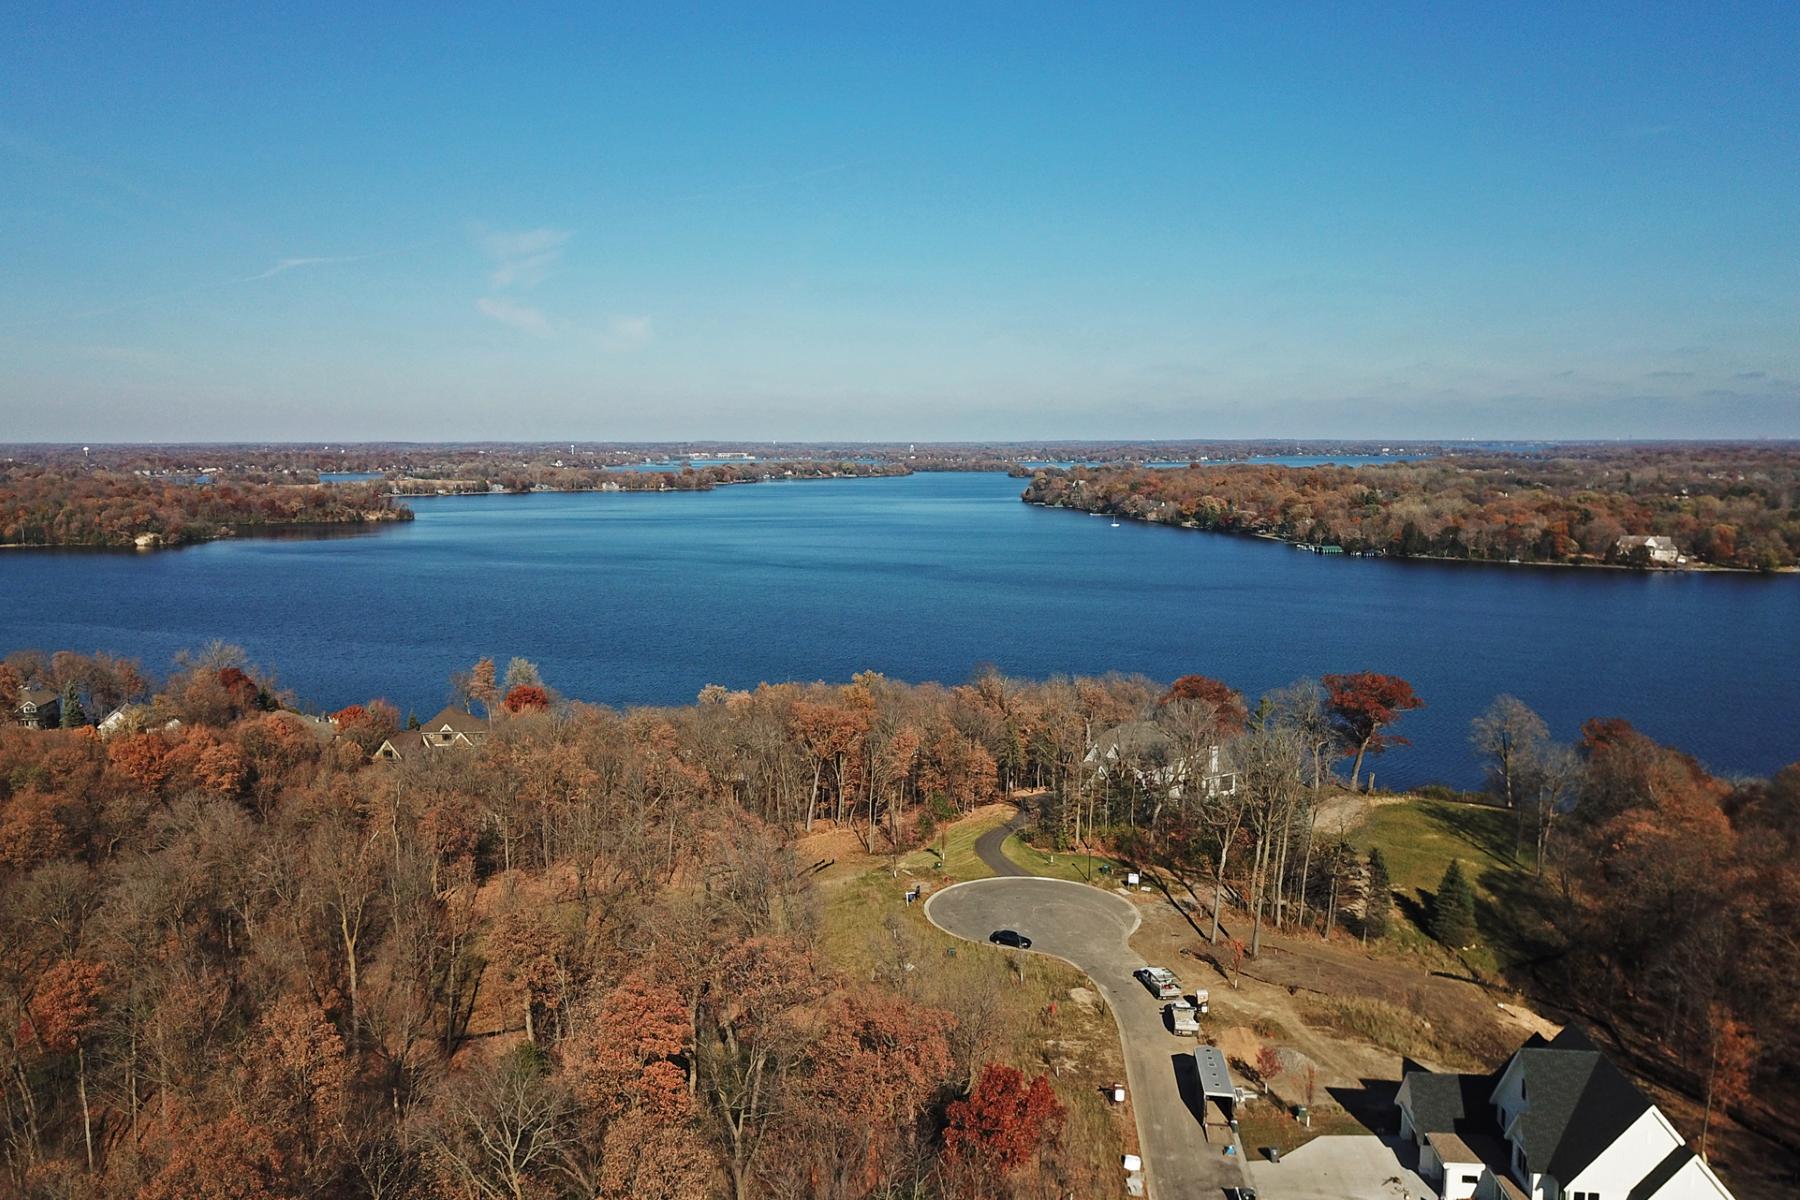 Land for Sale at Large 1.55 Acre Site in Hawks Pointe, Lake Minnetonka 6460 Hawks Pointe Lane Victoria, Minnesota 55331 United States